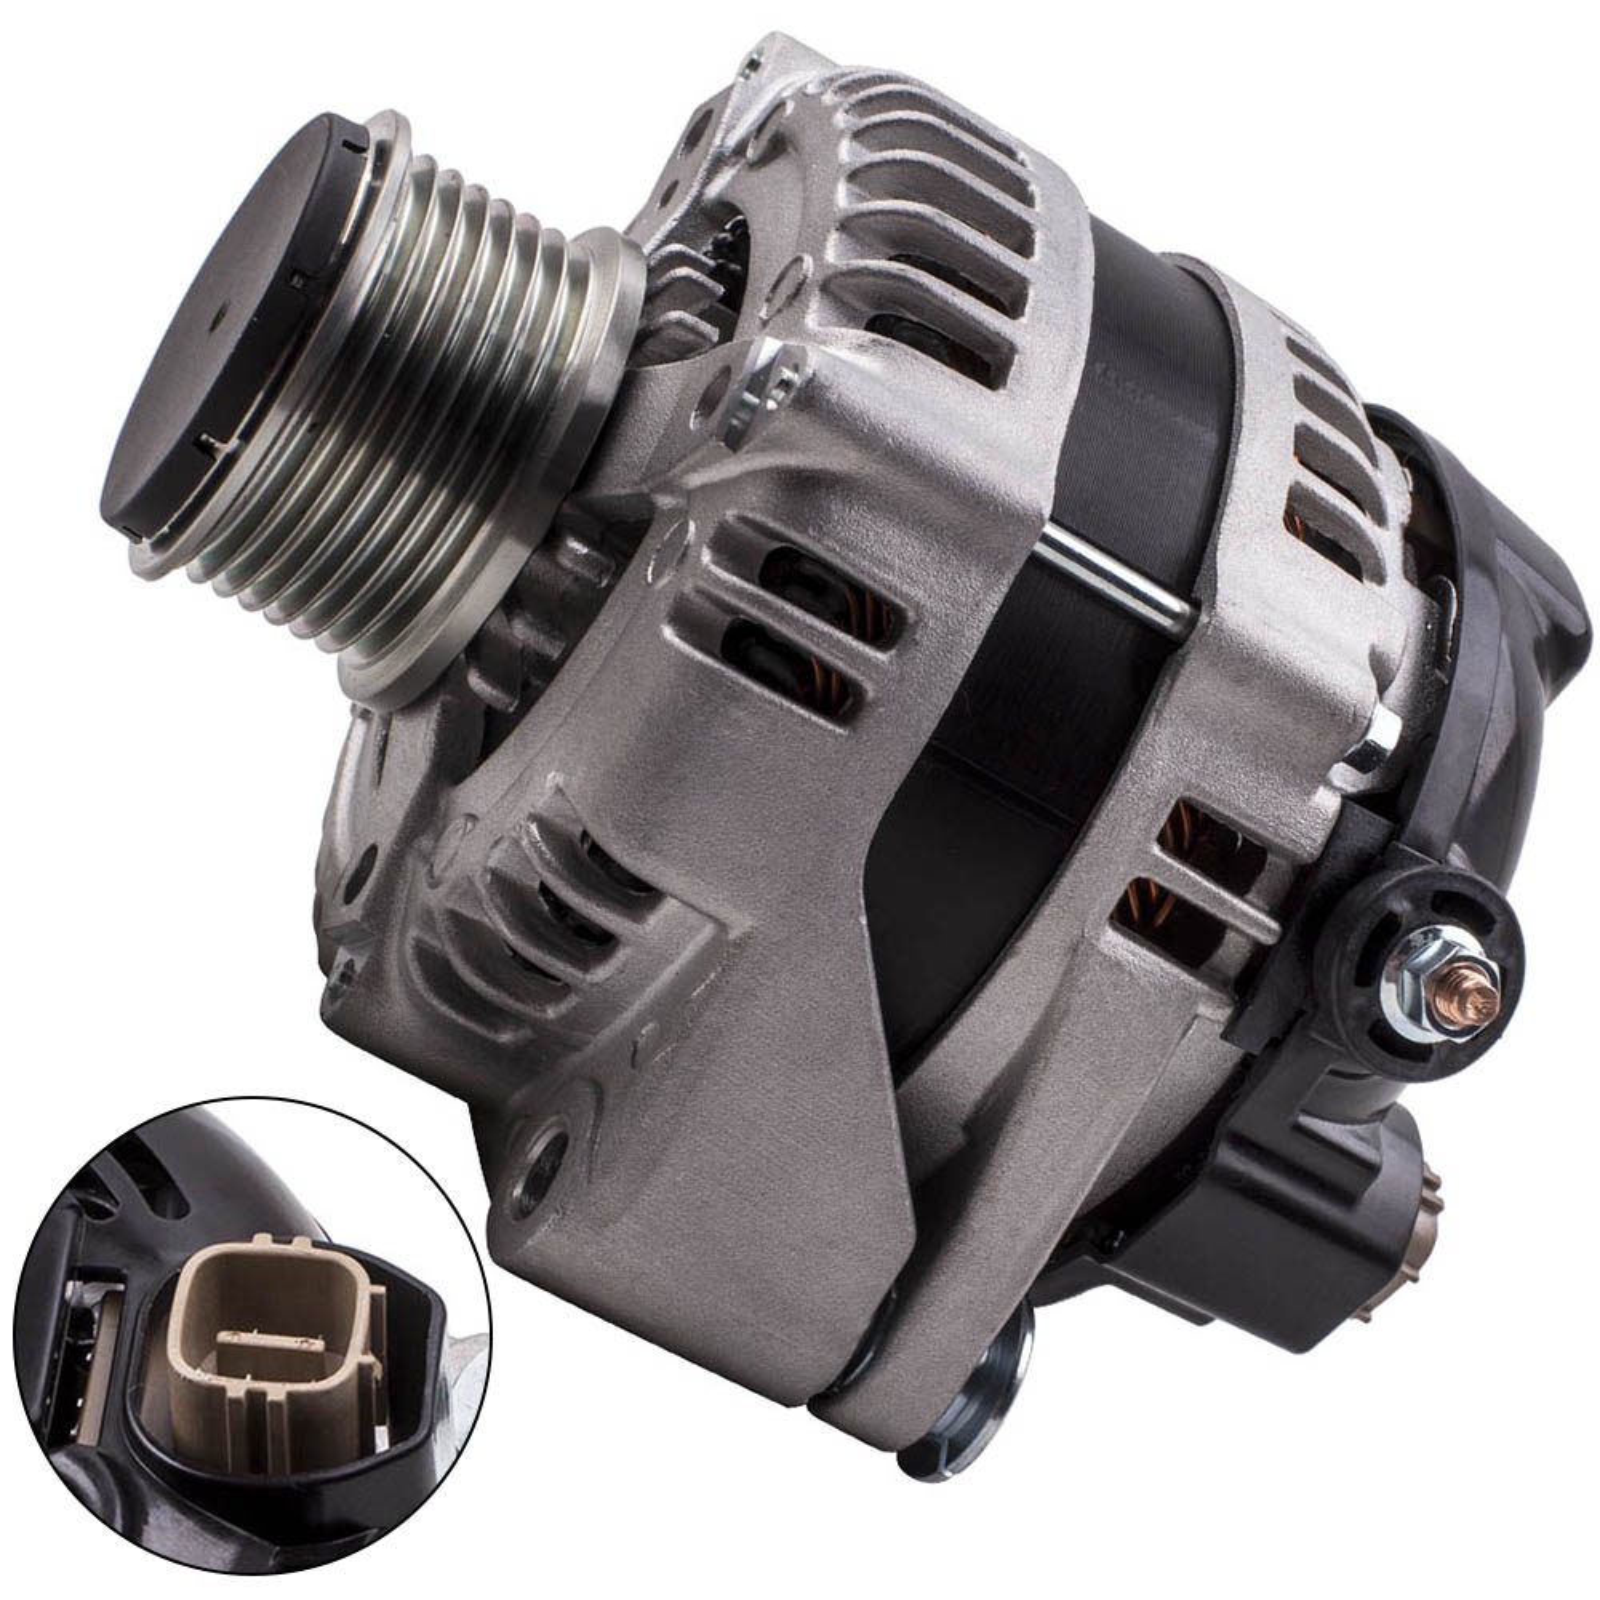 Alternator For Toyota Landcruiser Prado Kdj120 Engine 1kd